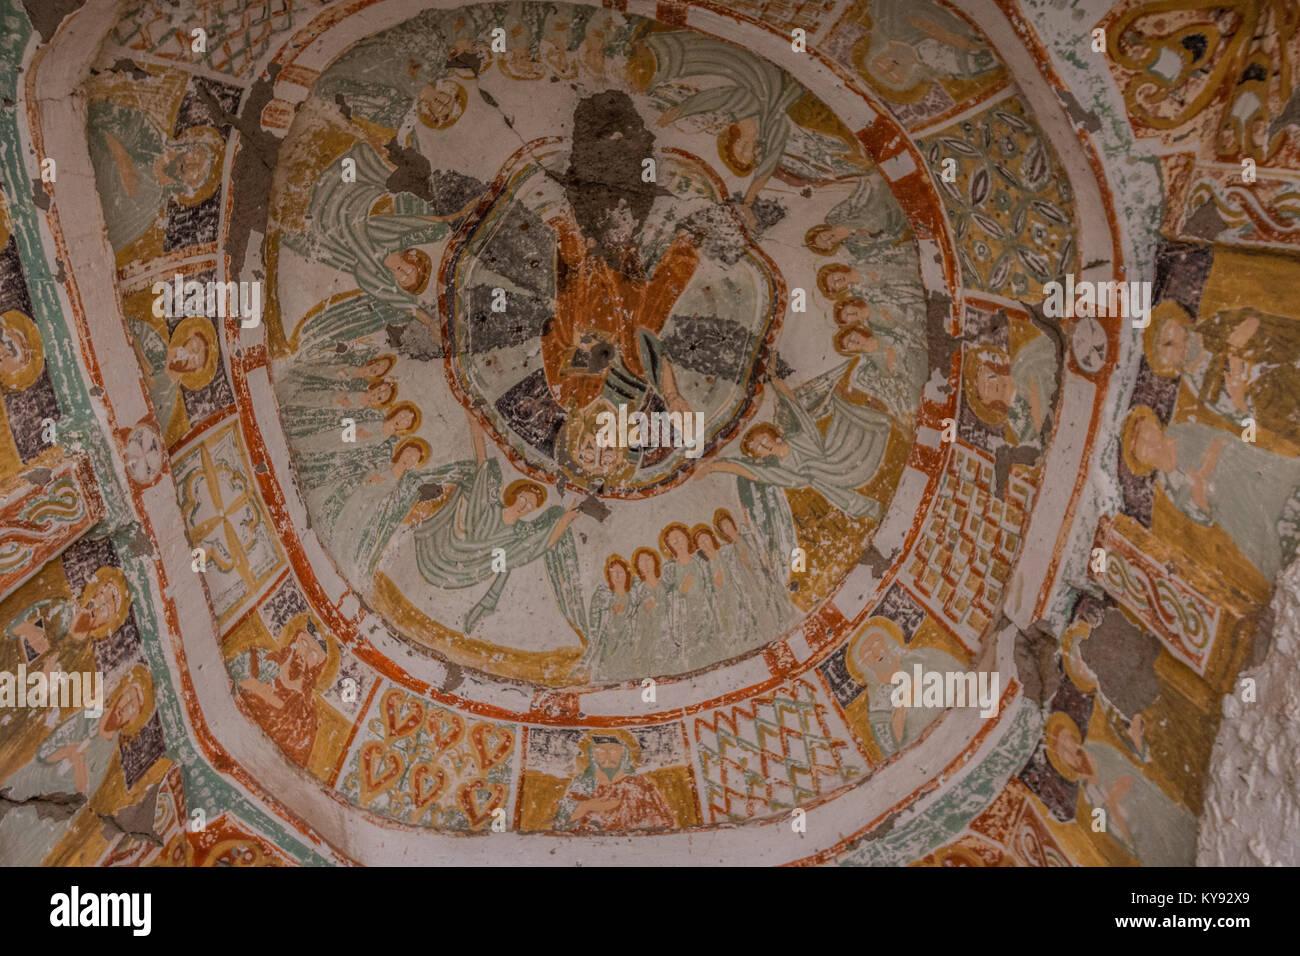 View inside Cave church in Cappadocia - Stock Image